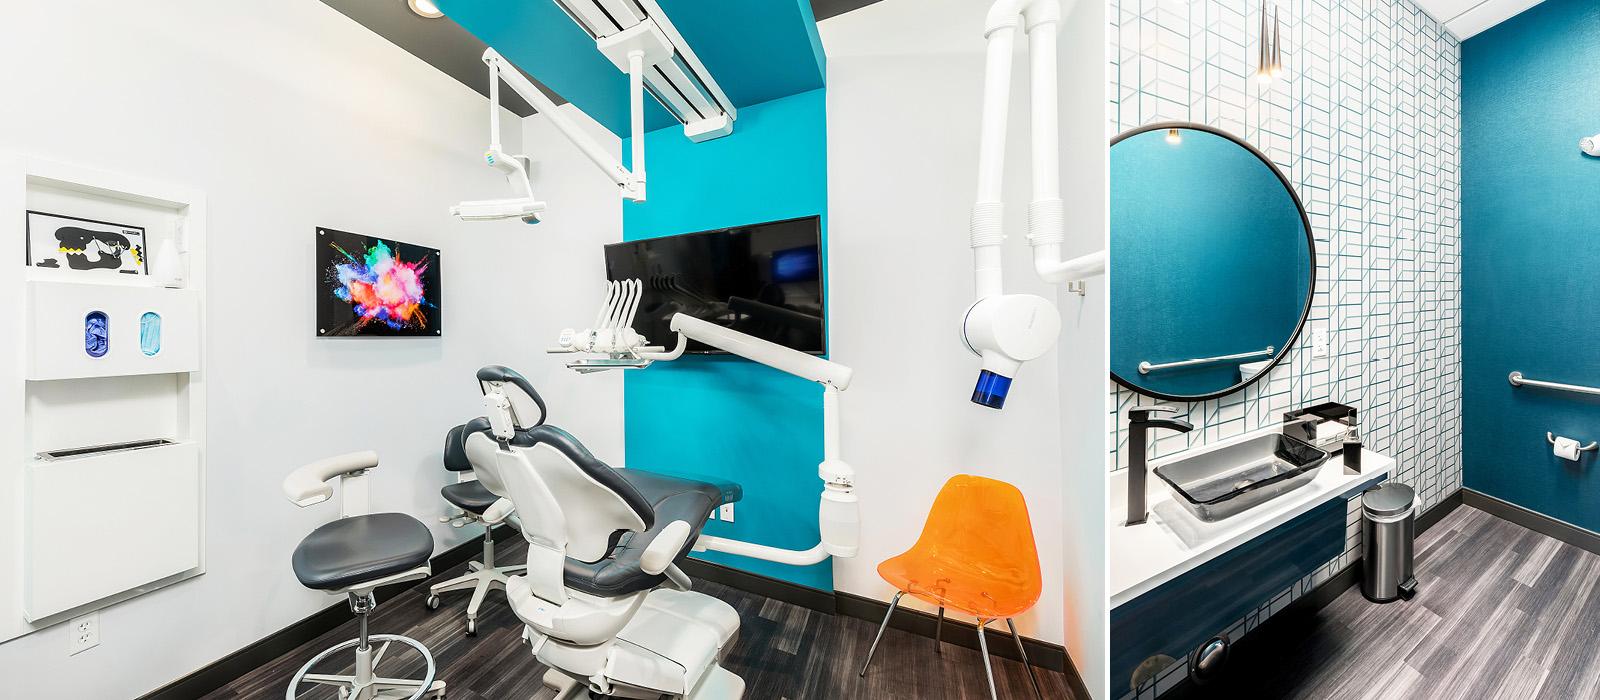 Byte Dentistry treatment area and bathroom facilities